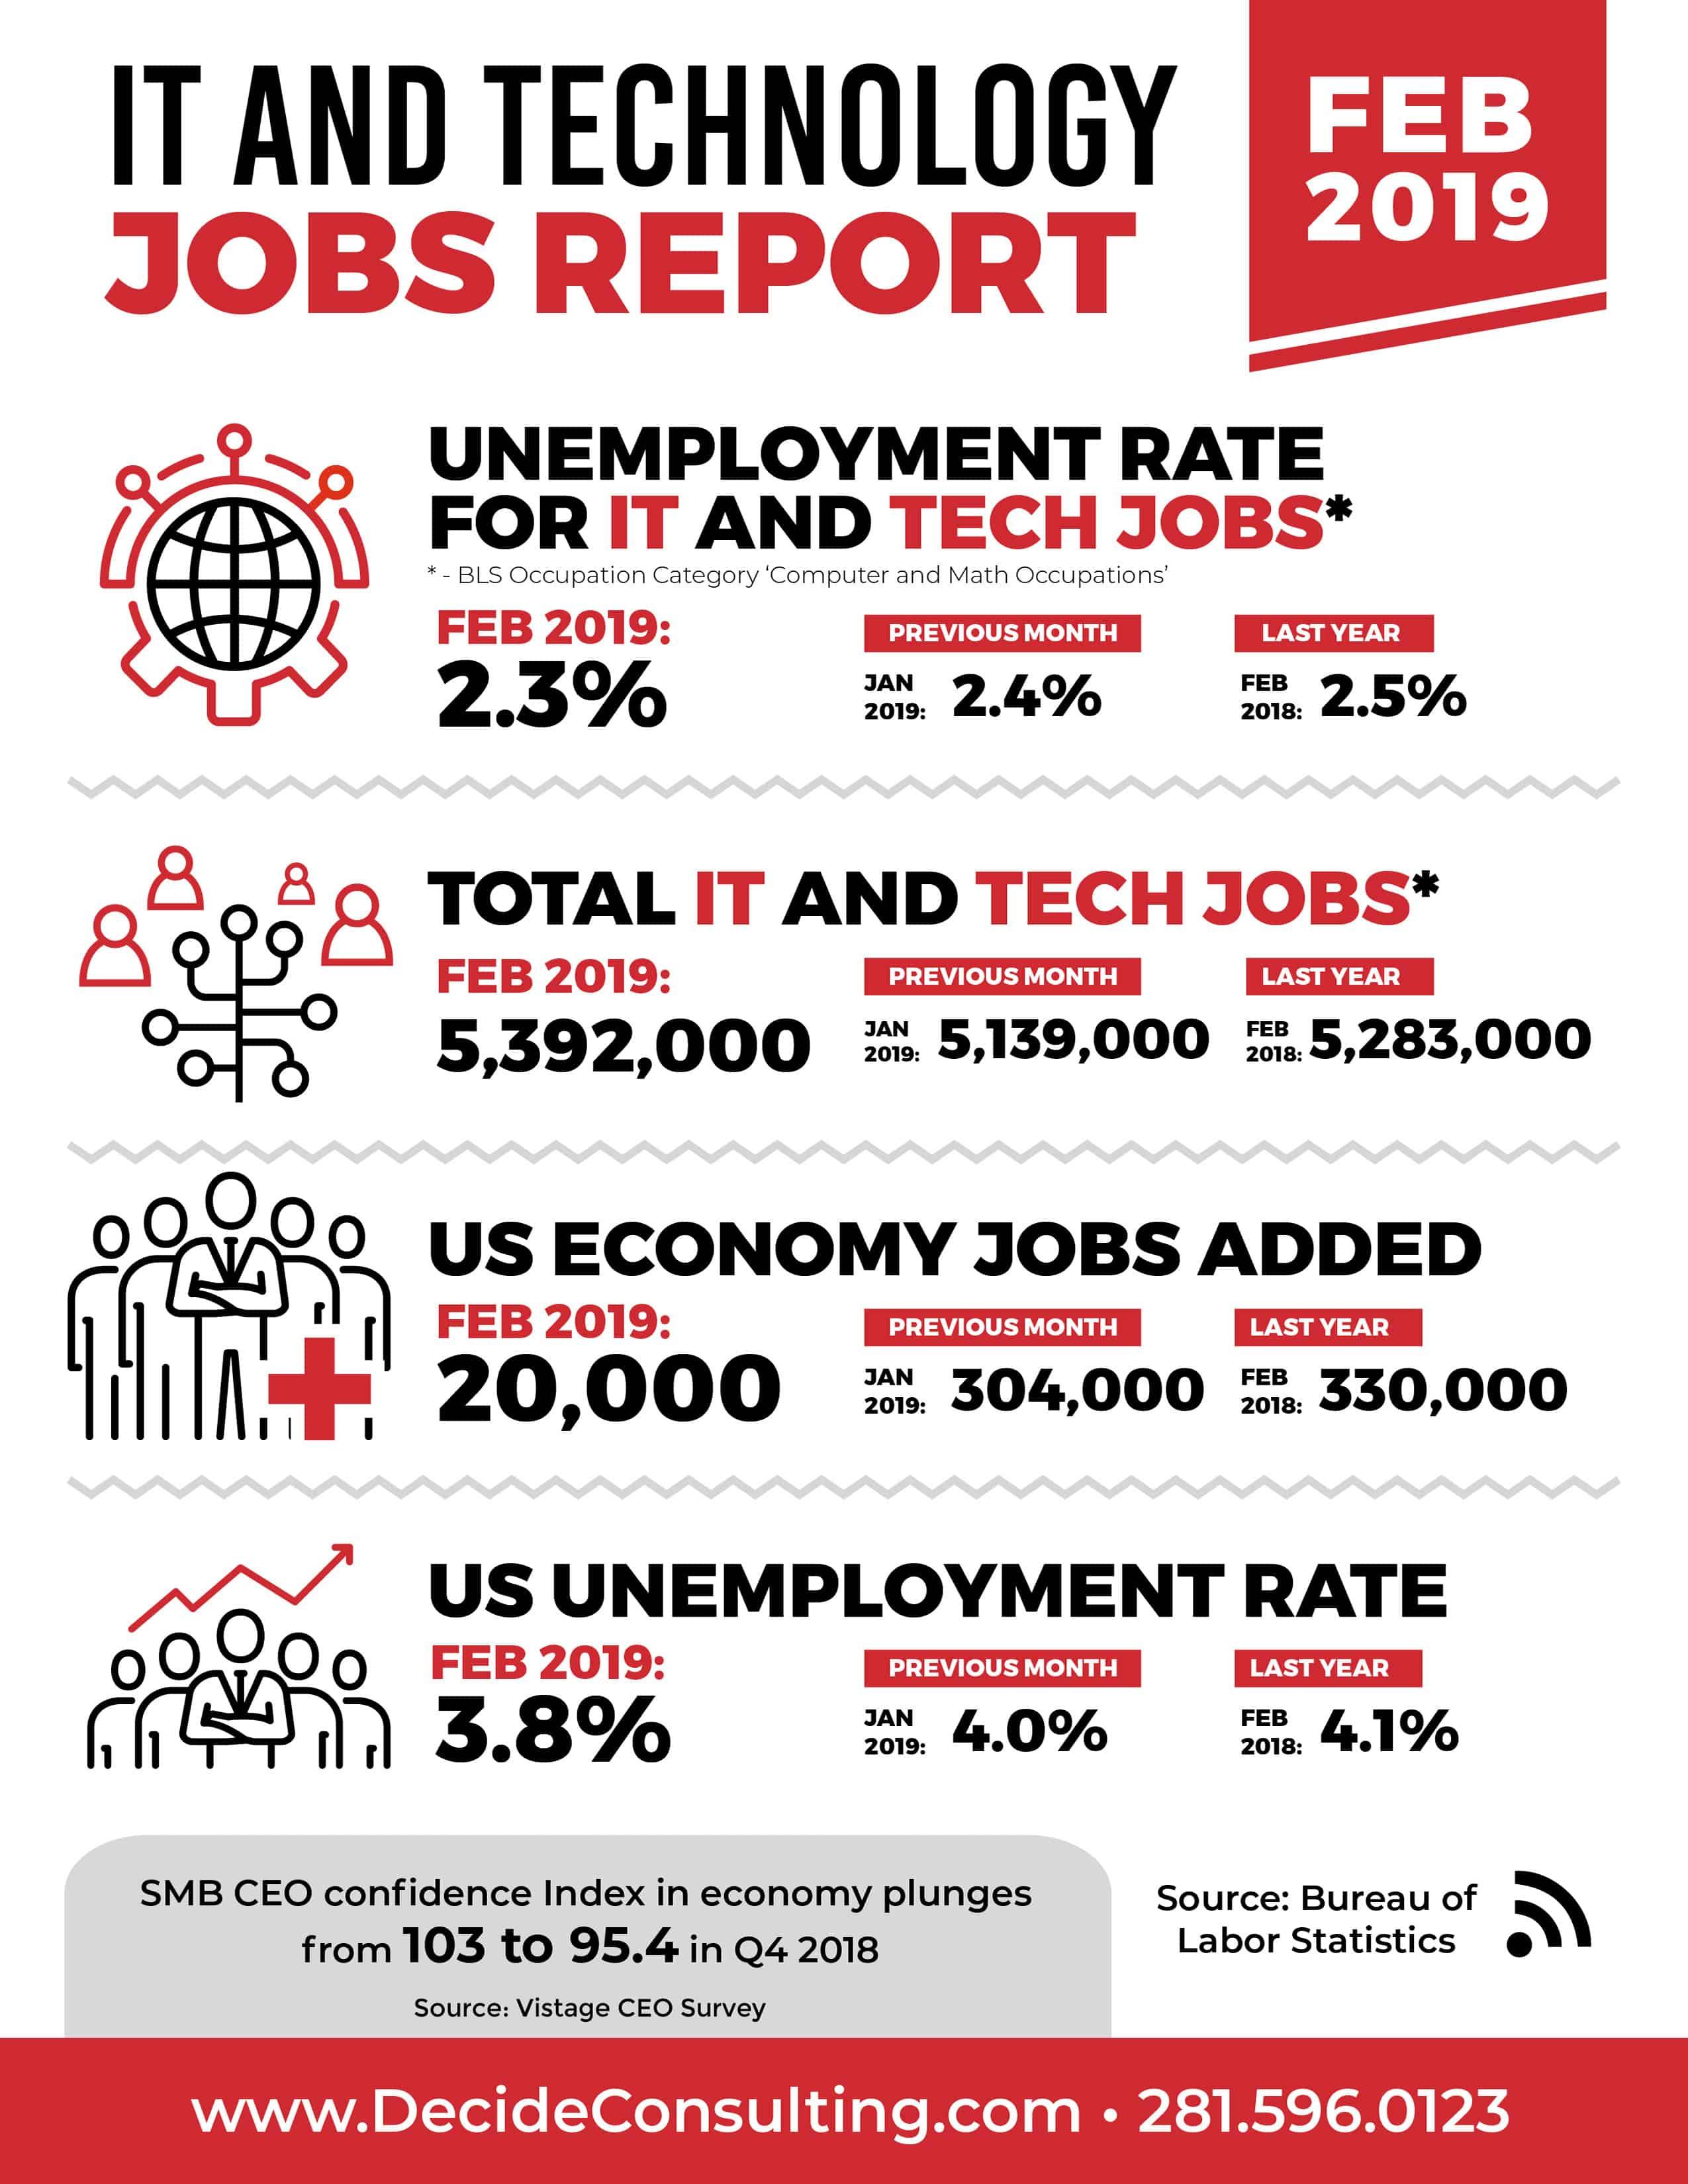 February 2019 Jobs Report